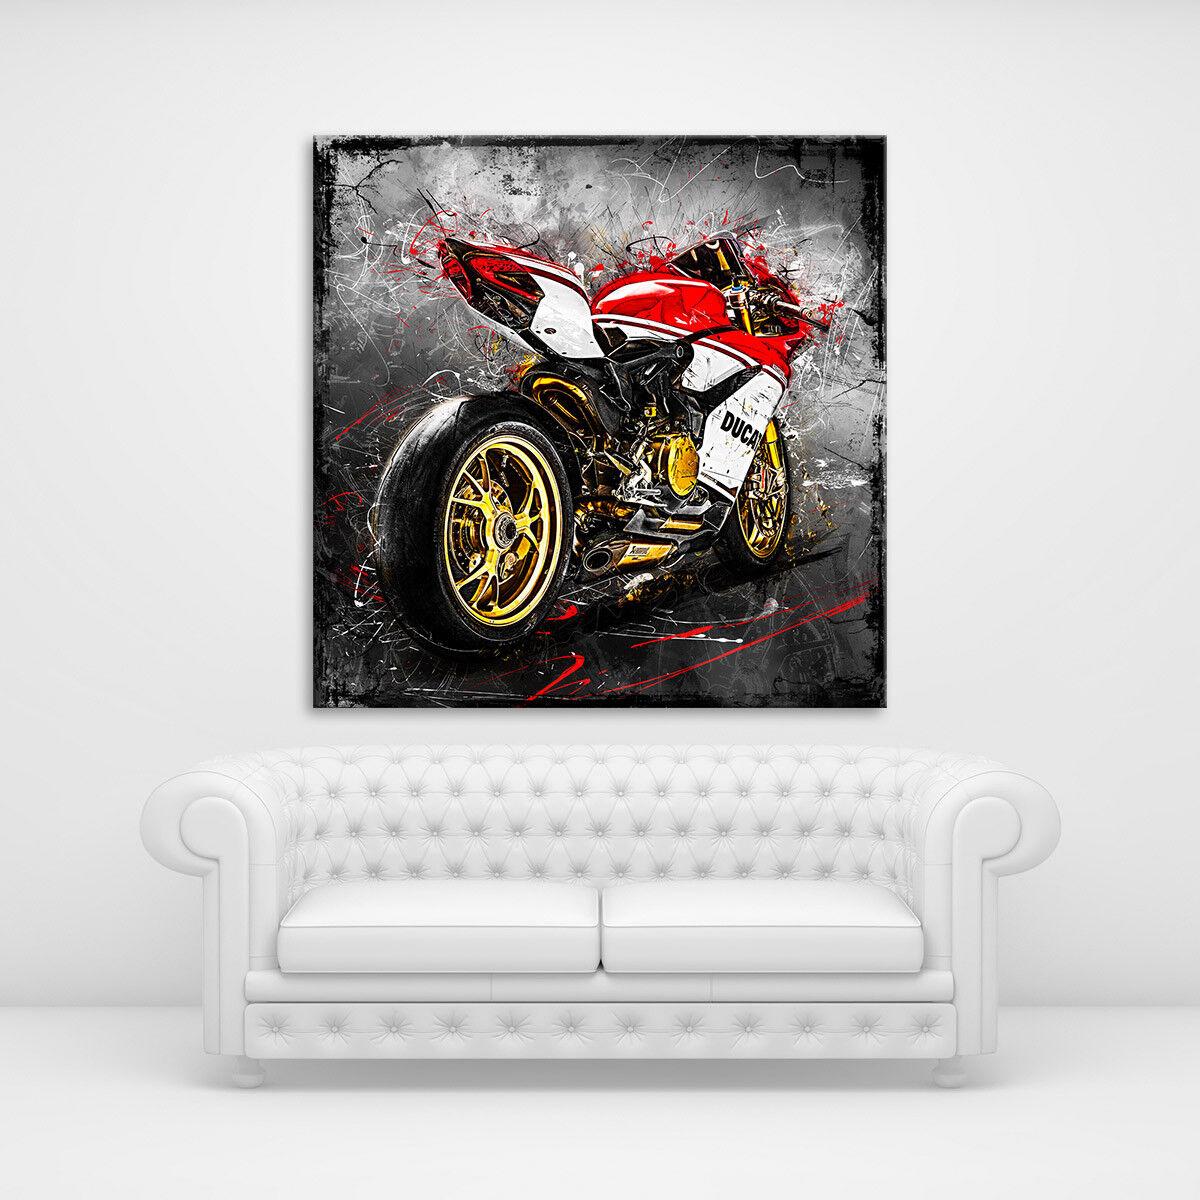 Ducati Panigale Leinwand Bild Modern Abstrakt Motorrad Wandbild Poster XXL